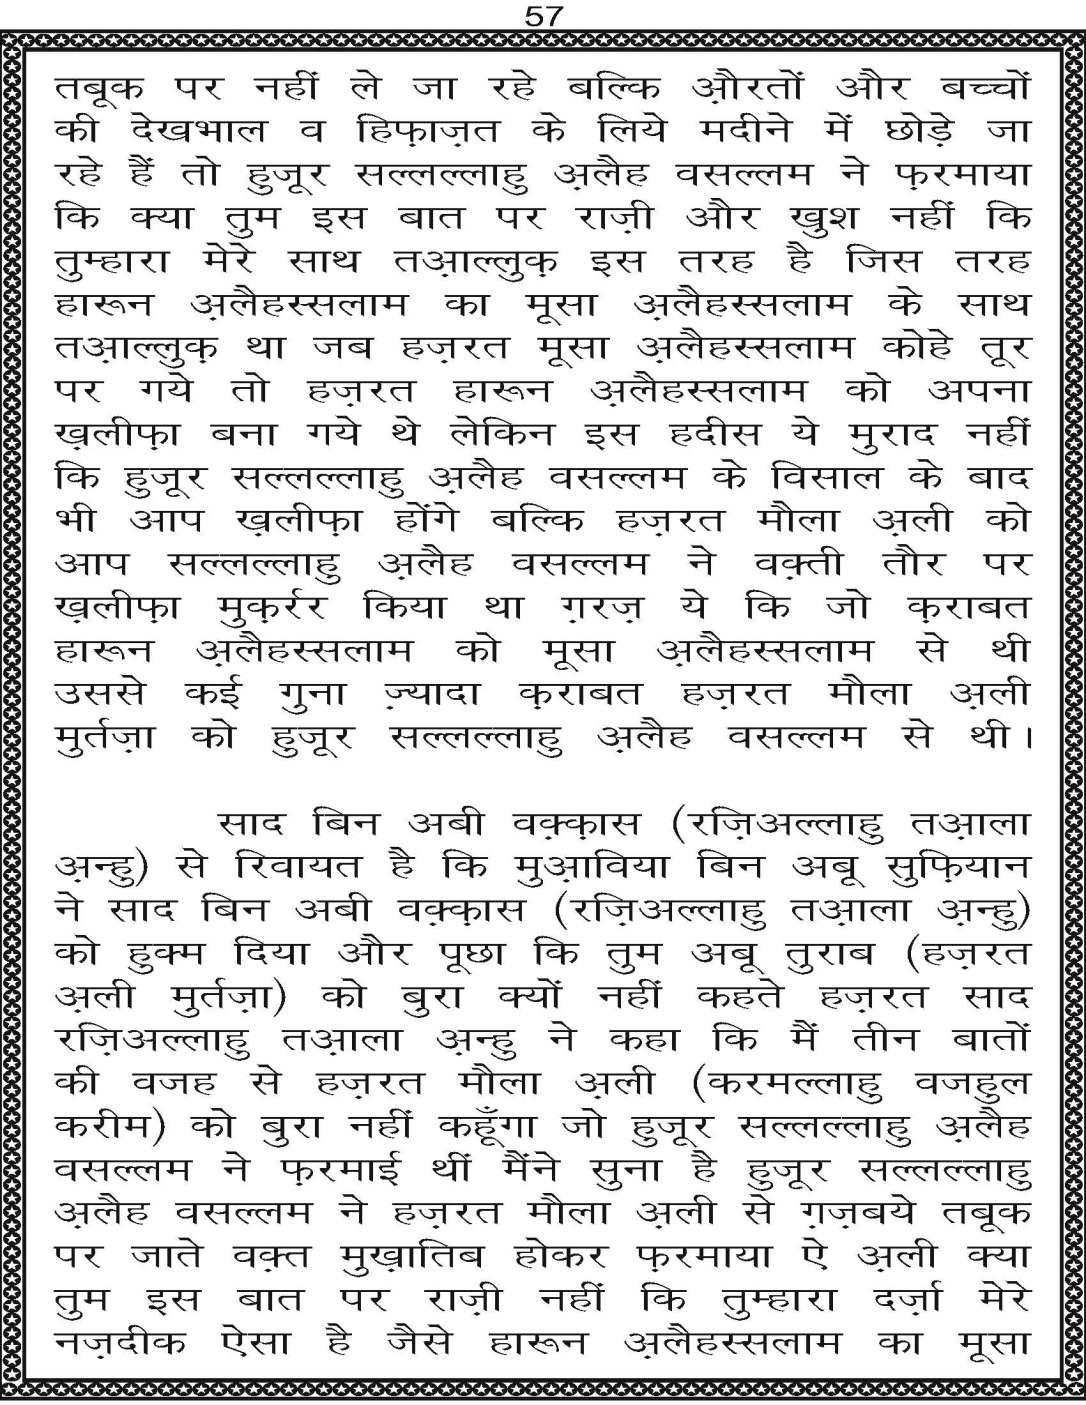 AzmateTaziyadari_Page_057